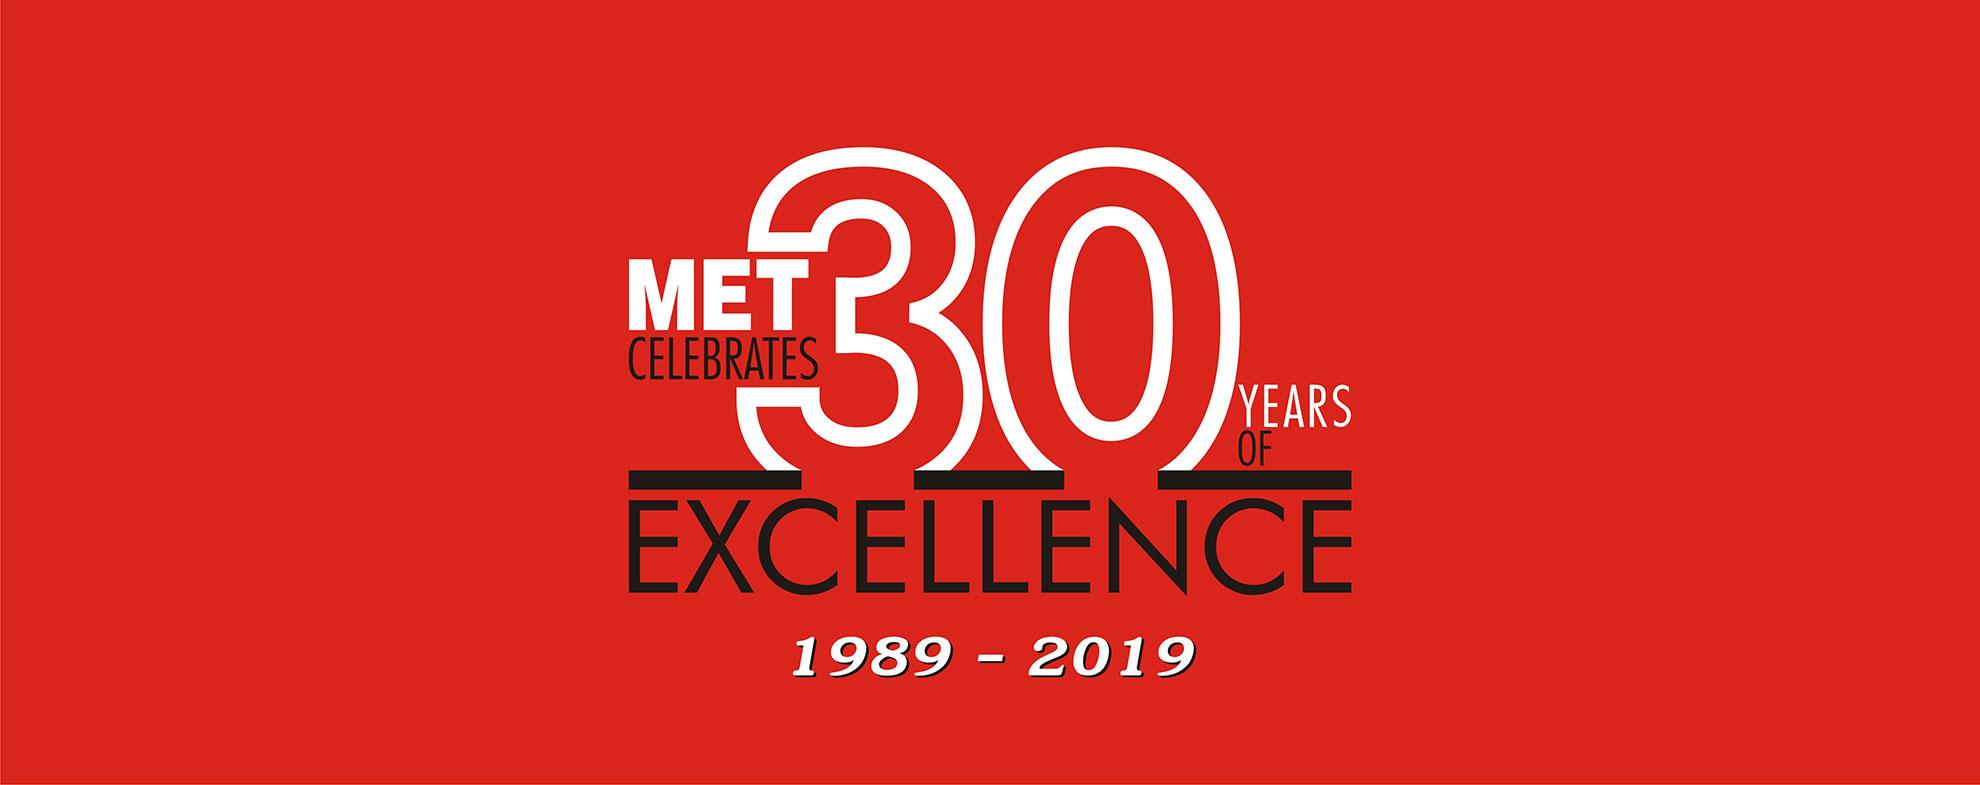 30 years web bannner